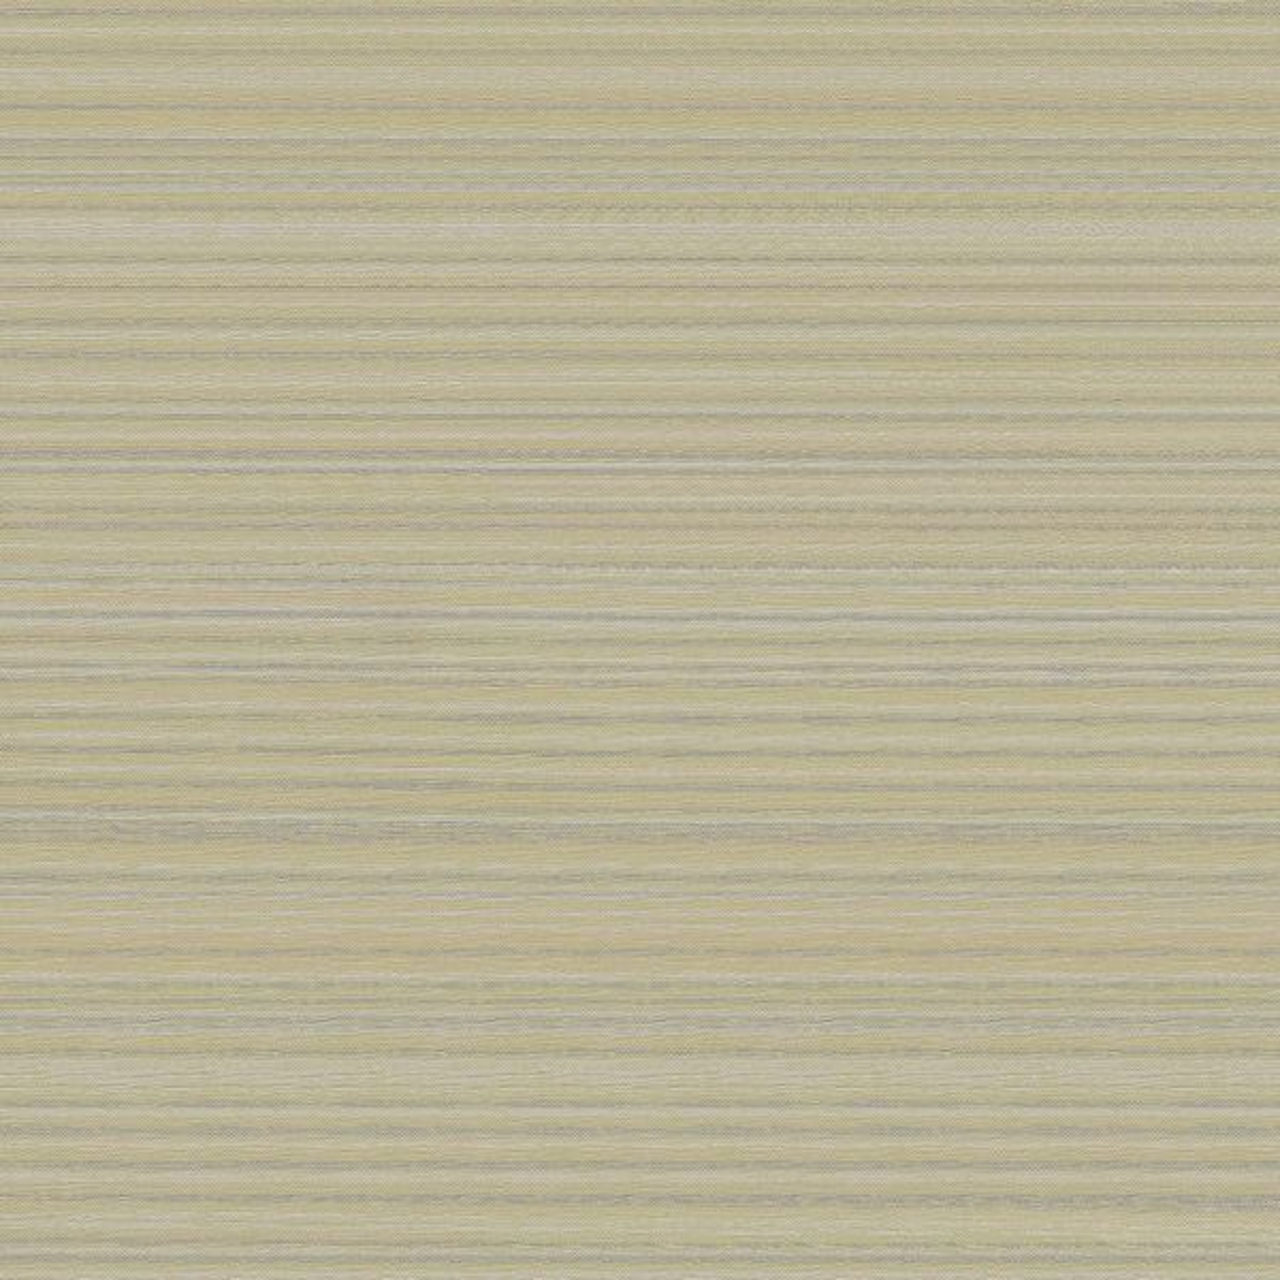 کاغذ دیواری والرین آلبوم هامبر کد 11105